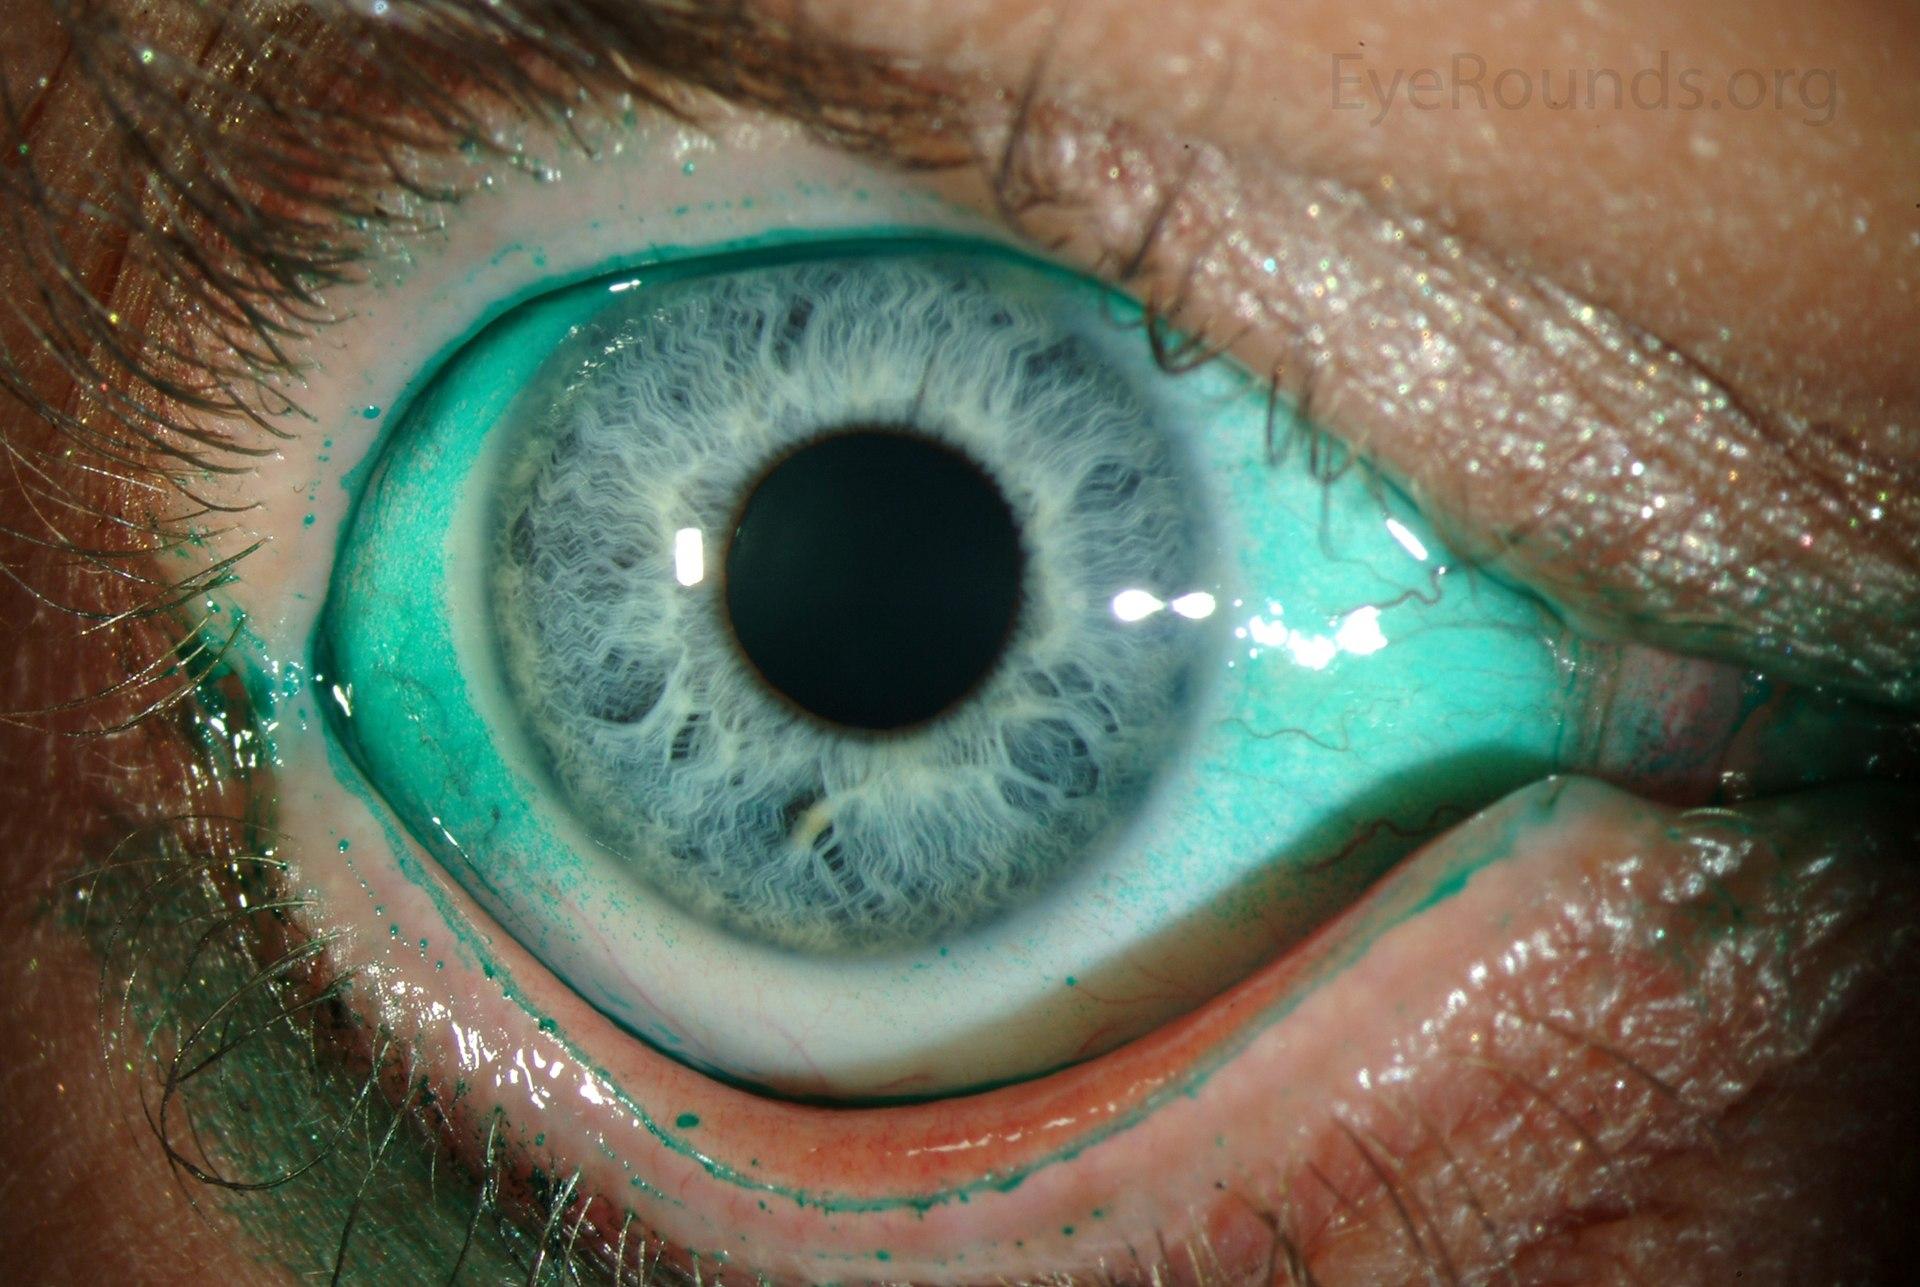 Dry Eye Syndrome Wikipedia